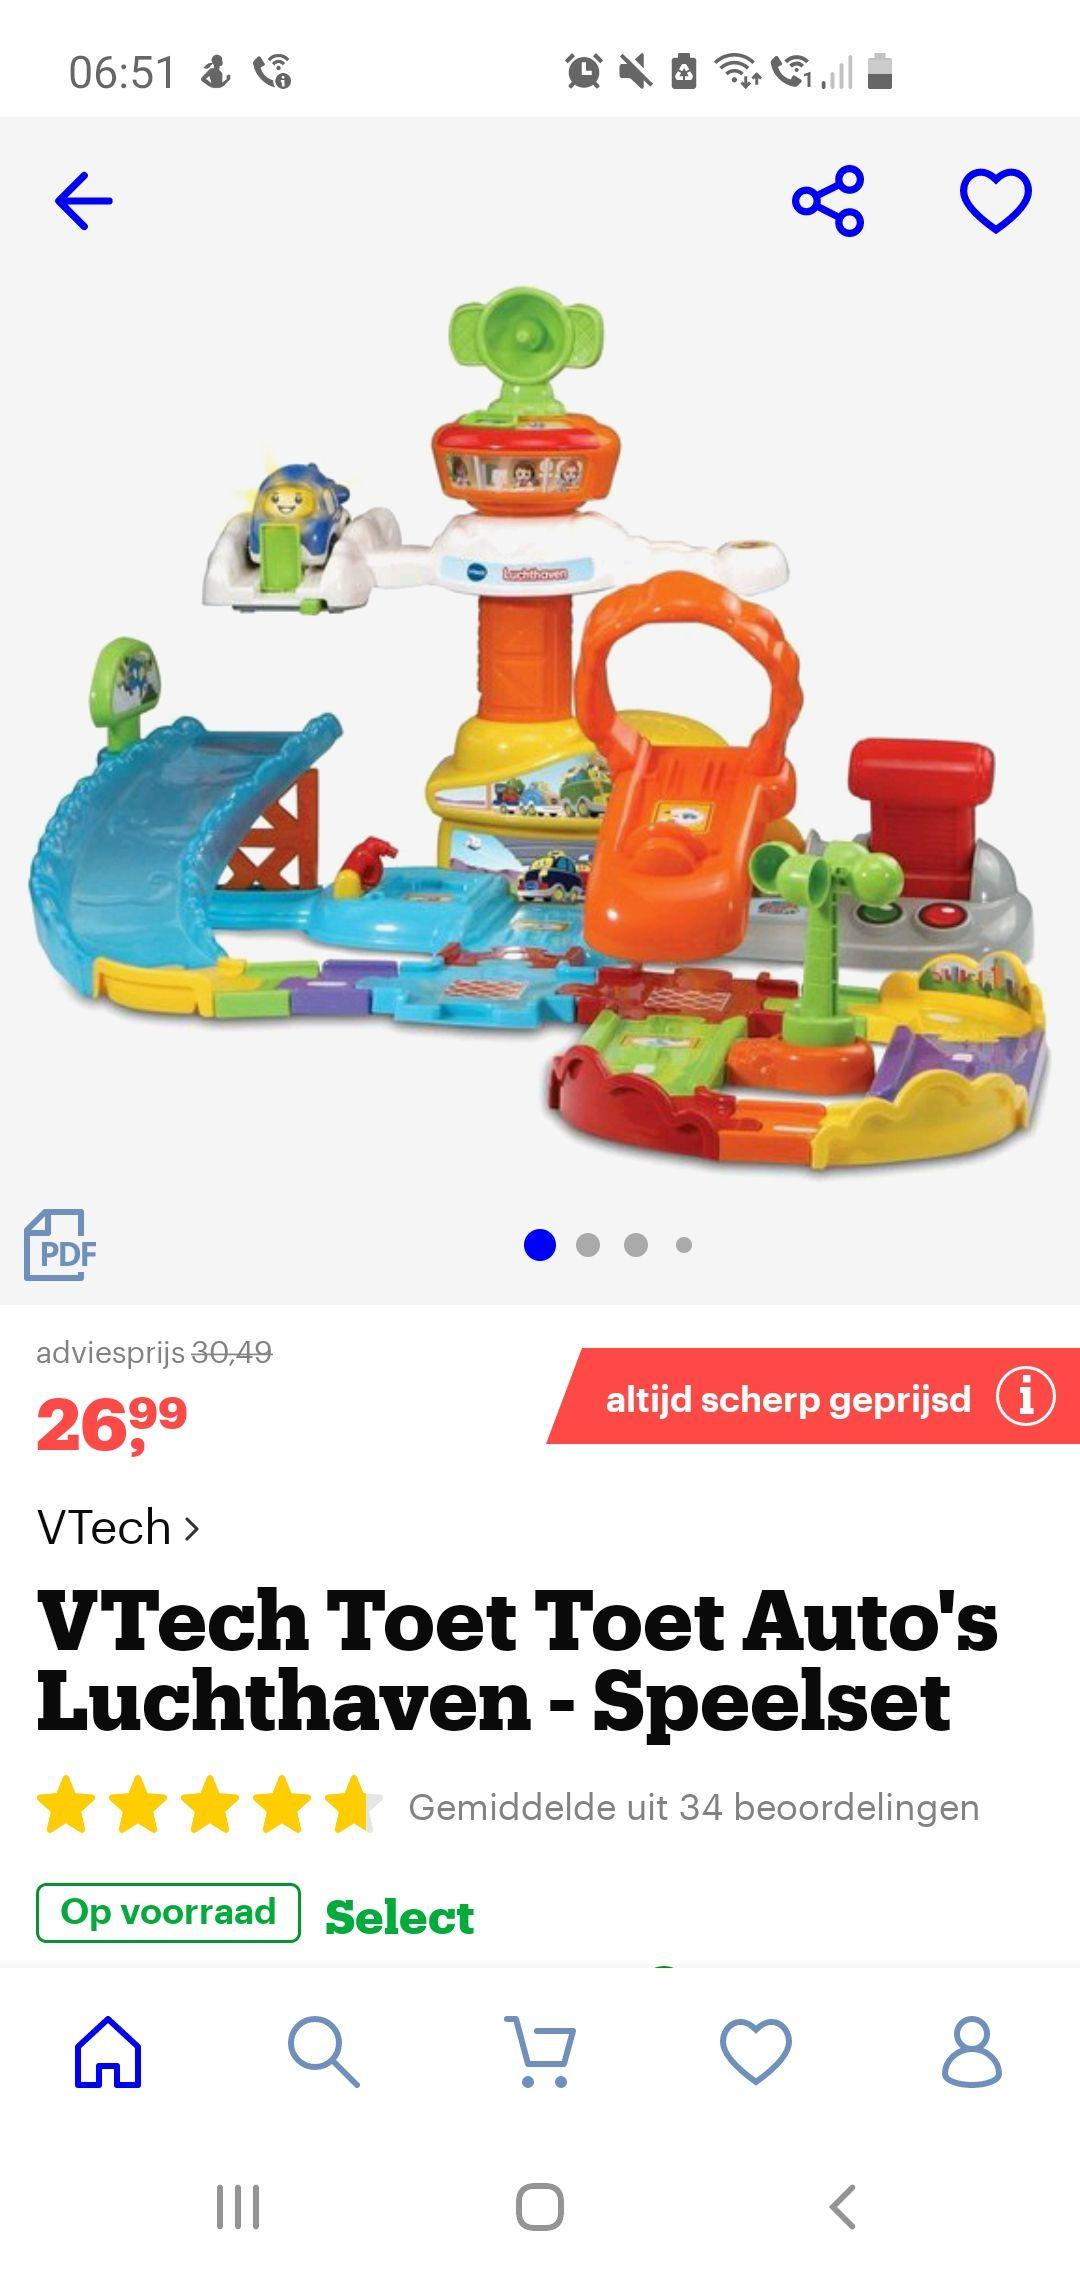 VTech Toet Toet Auto's Luchthaven - Speelset